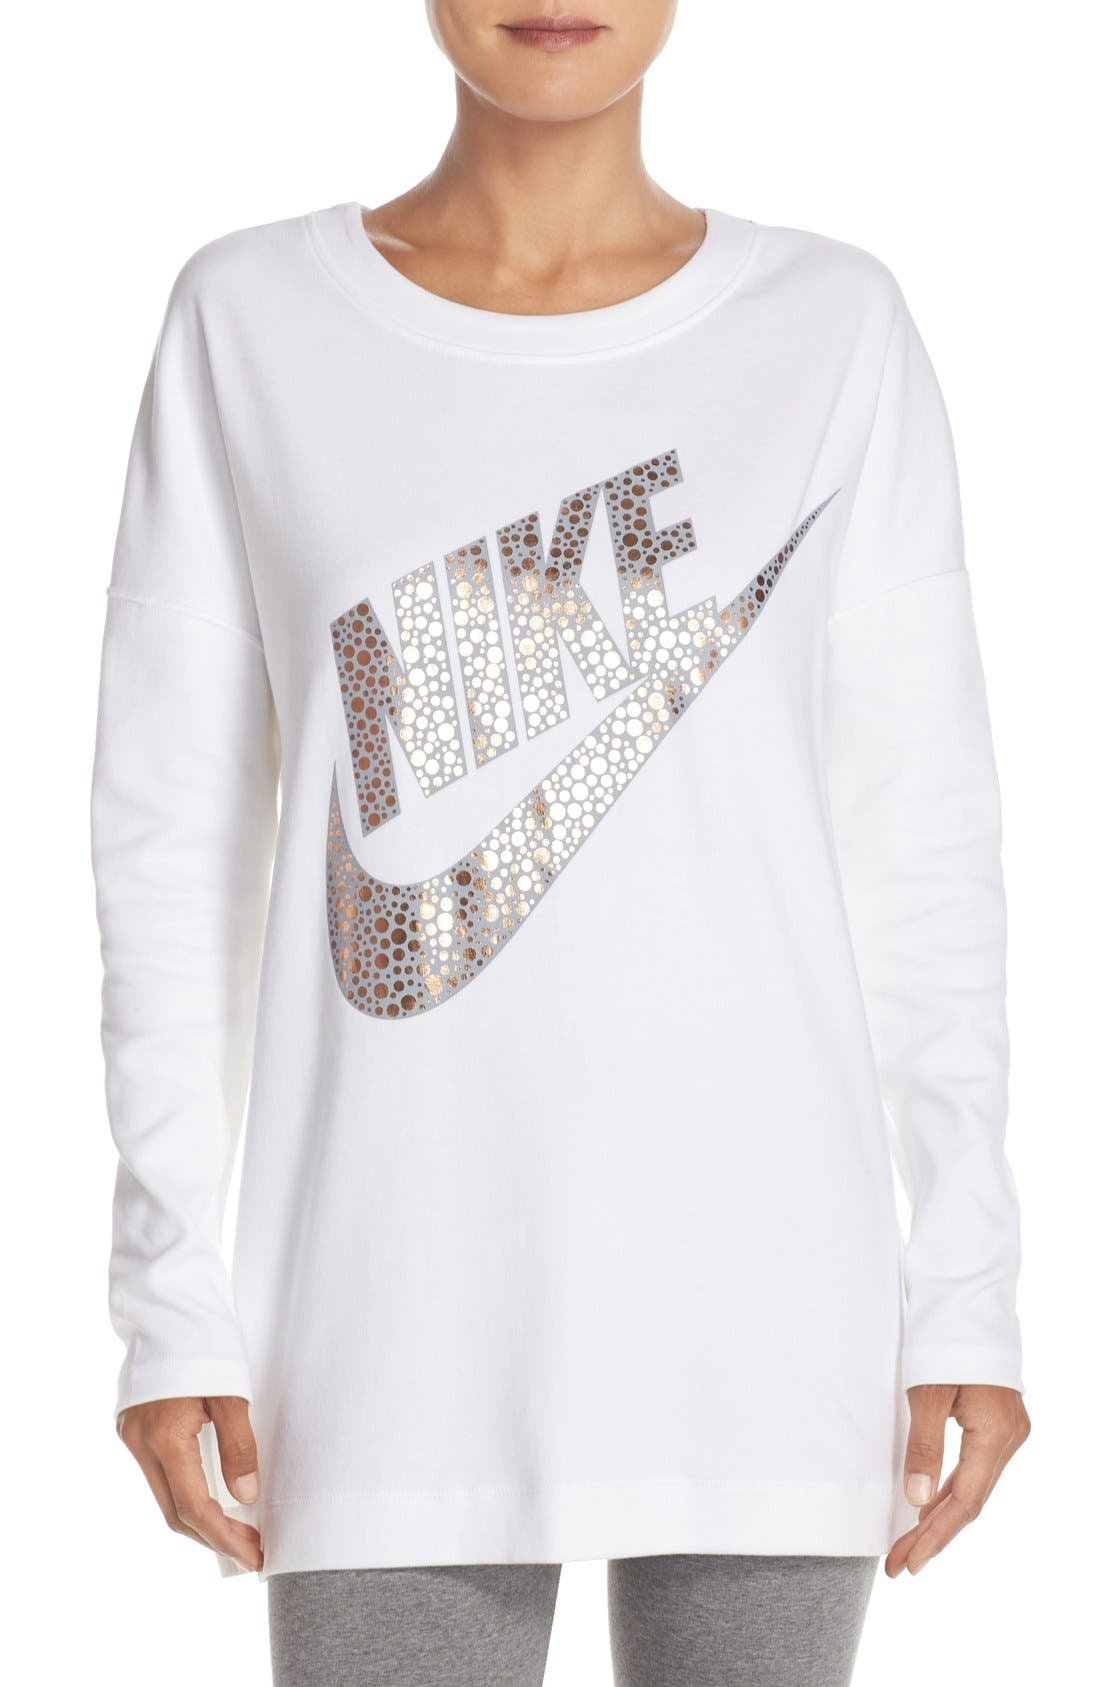 Main Image - Nike Logo Graphic Sweatshirt